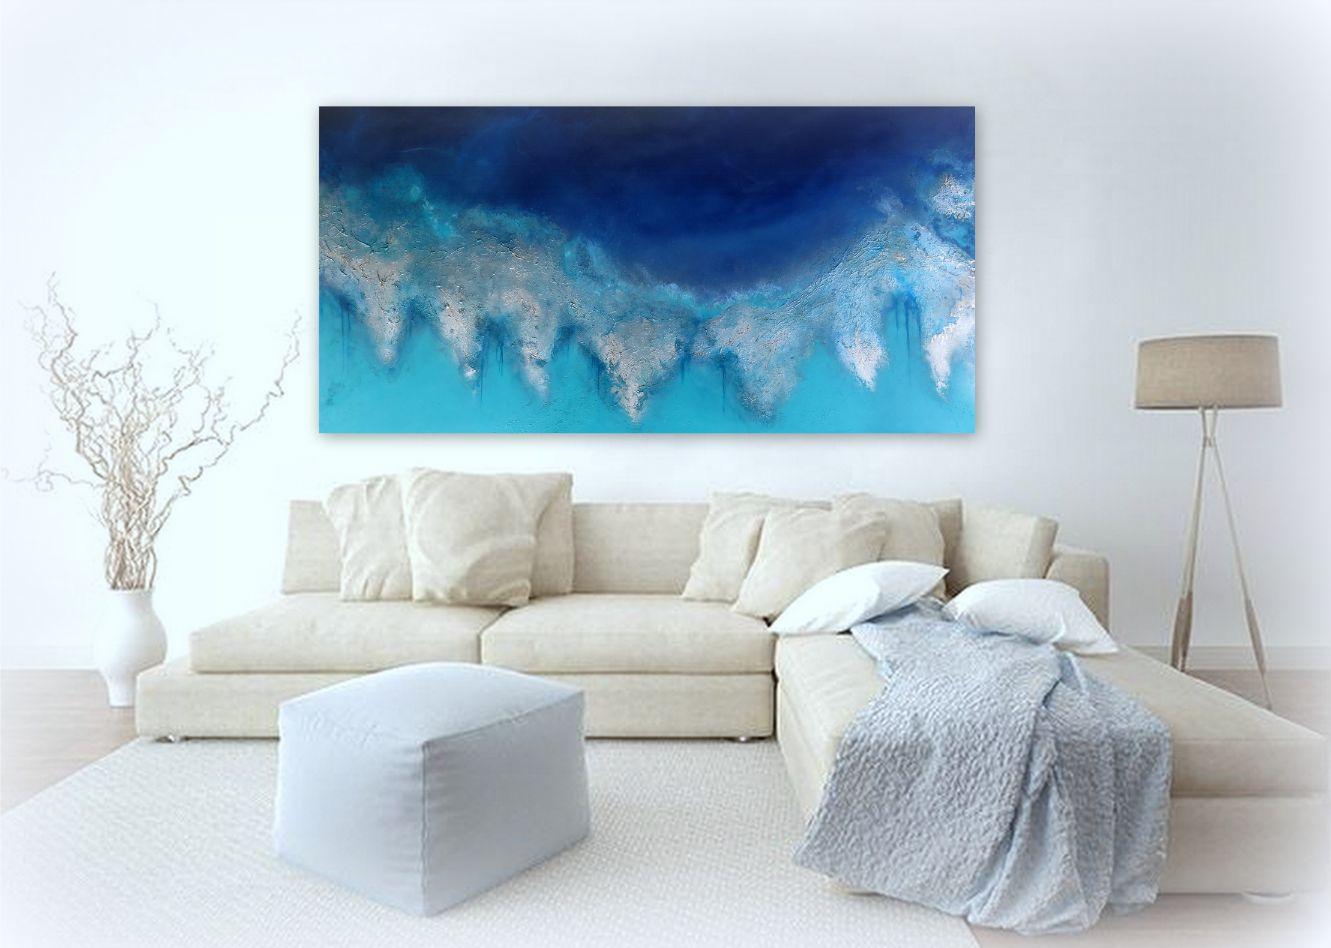 Sudbury Reefs Edge Painting For Sale By Petra Meikle De Vlas19